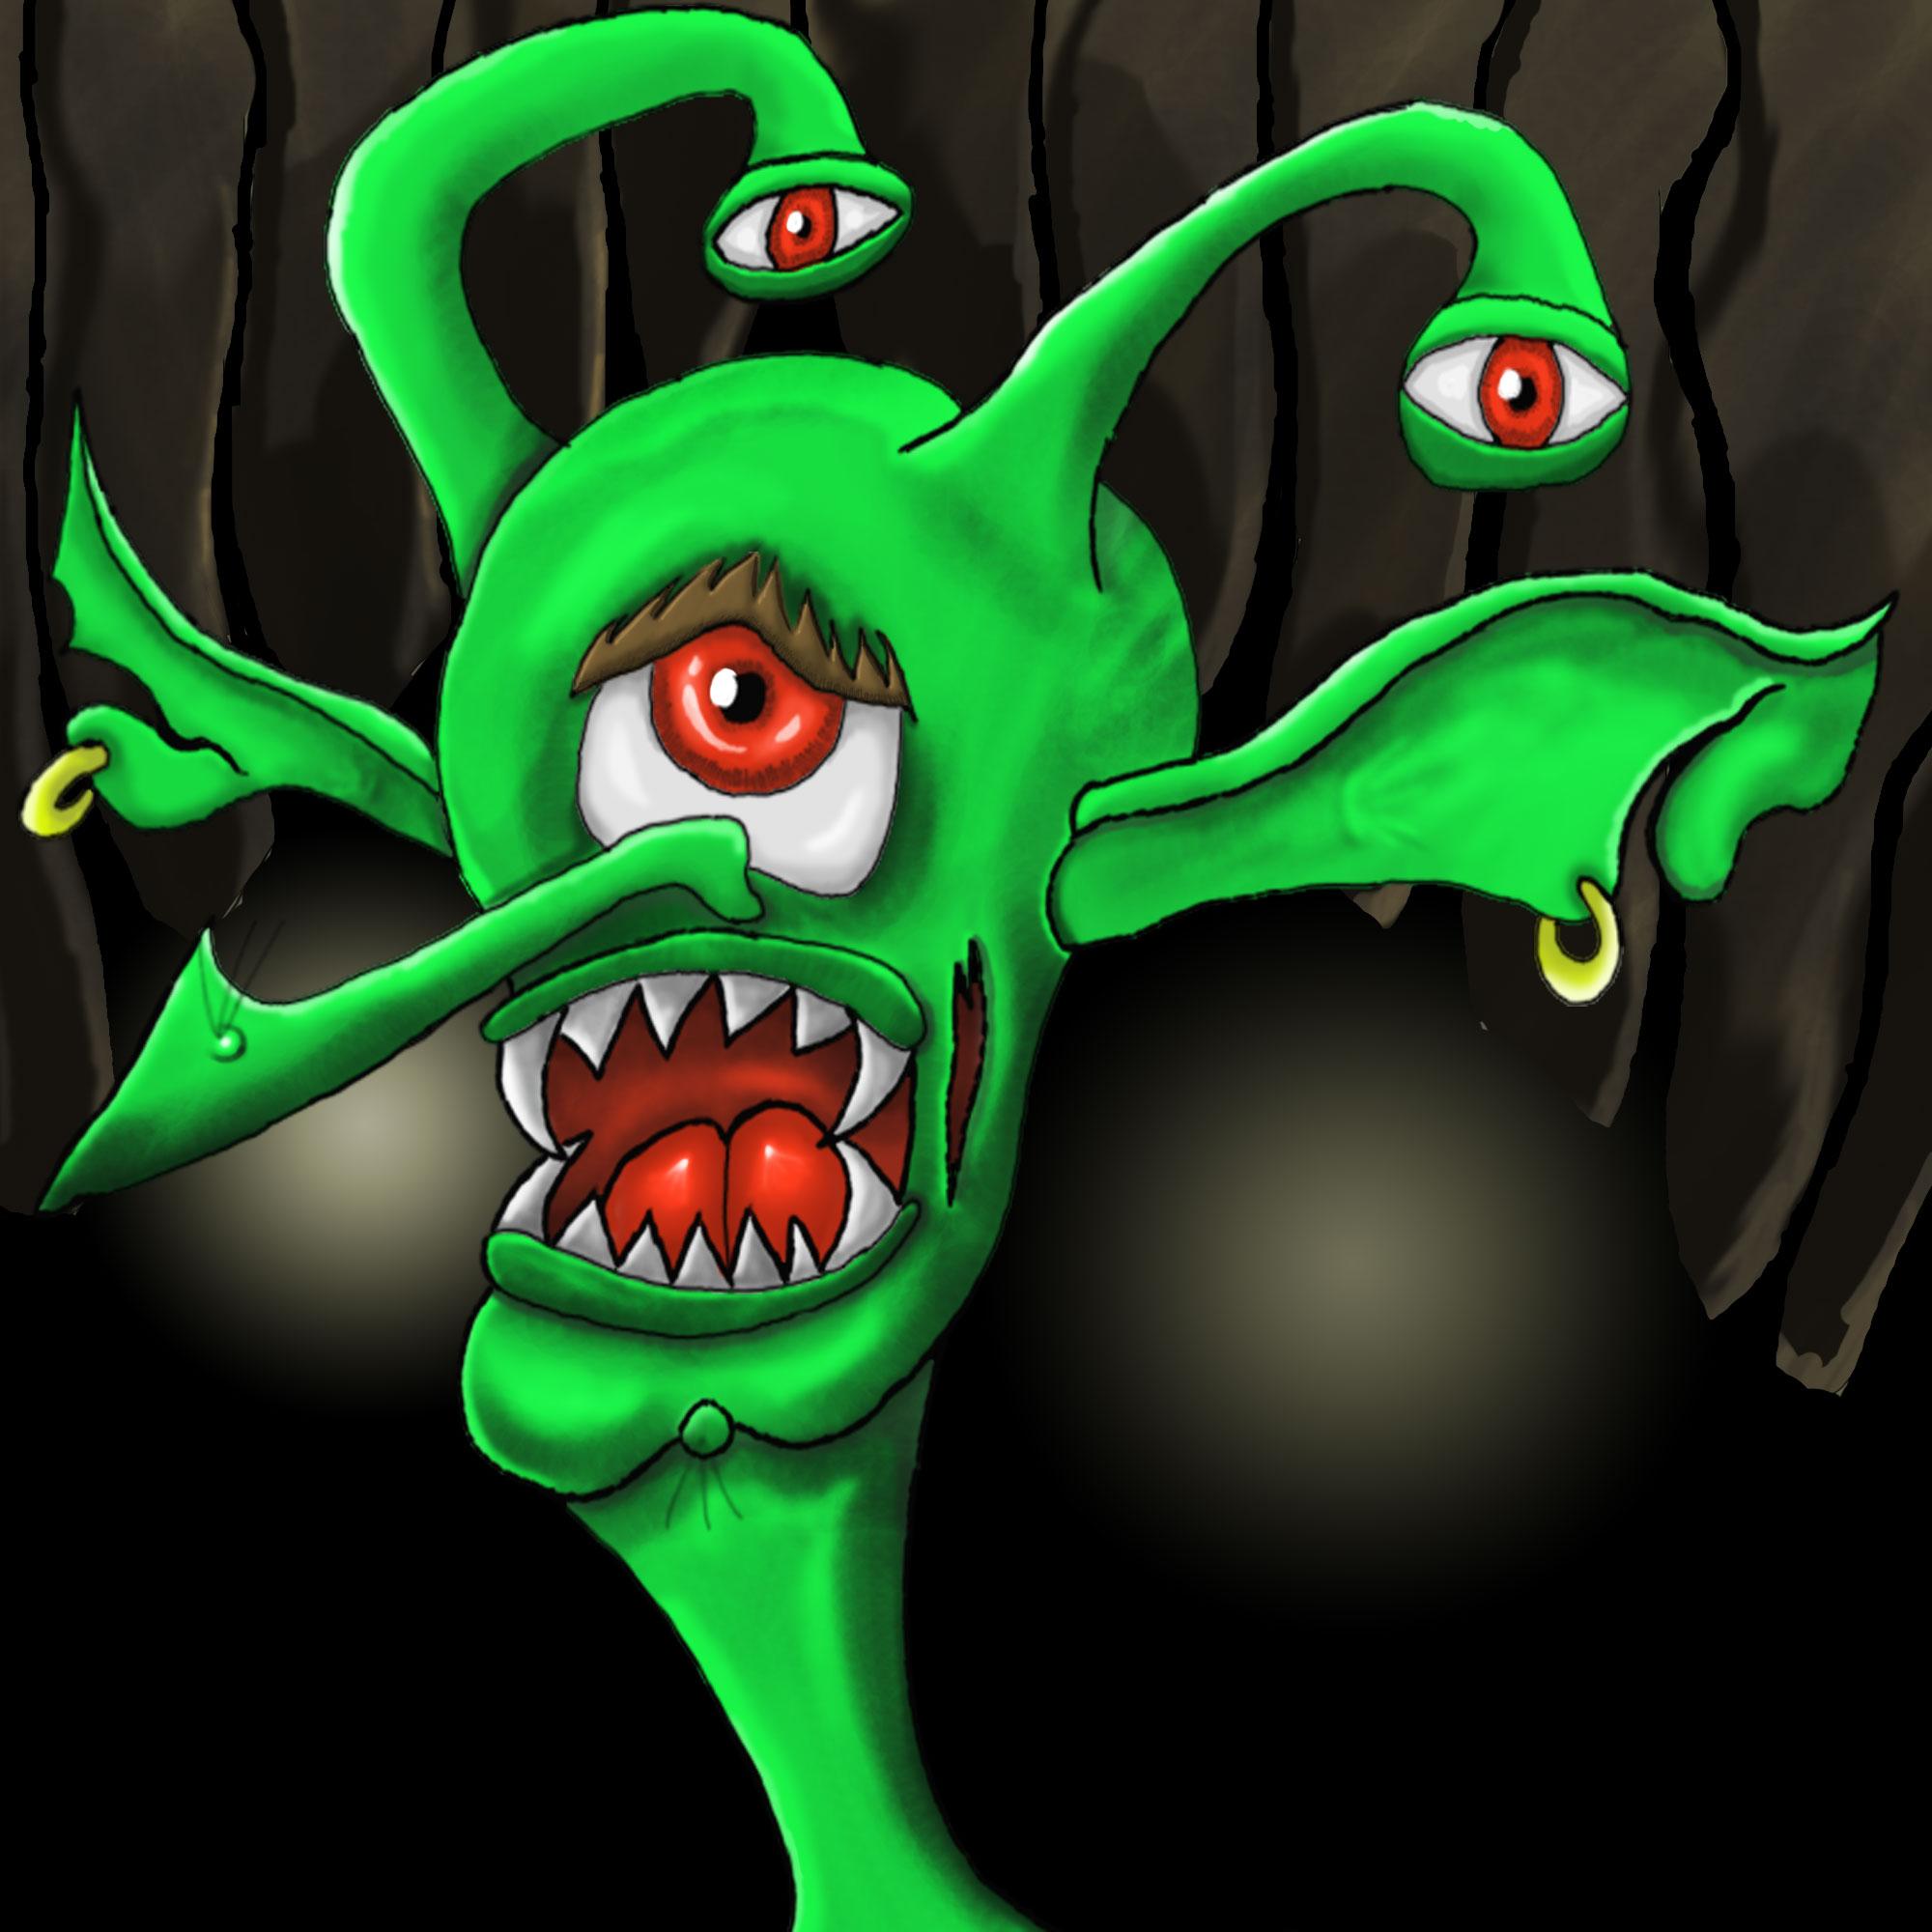 One eyed Goblin